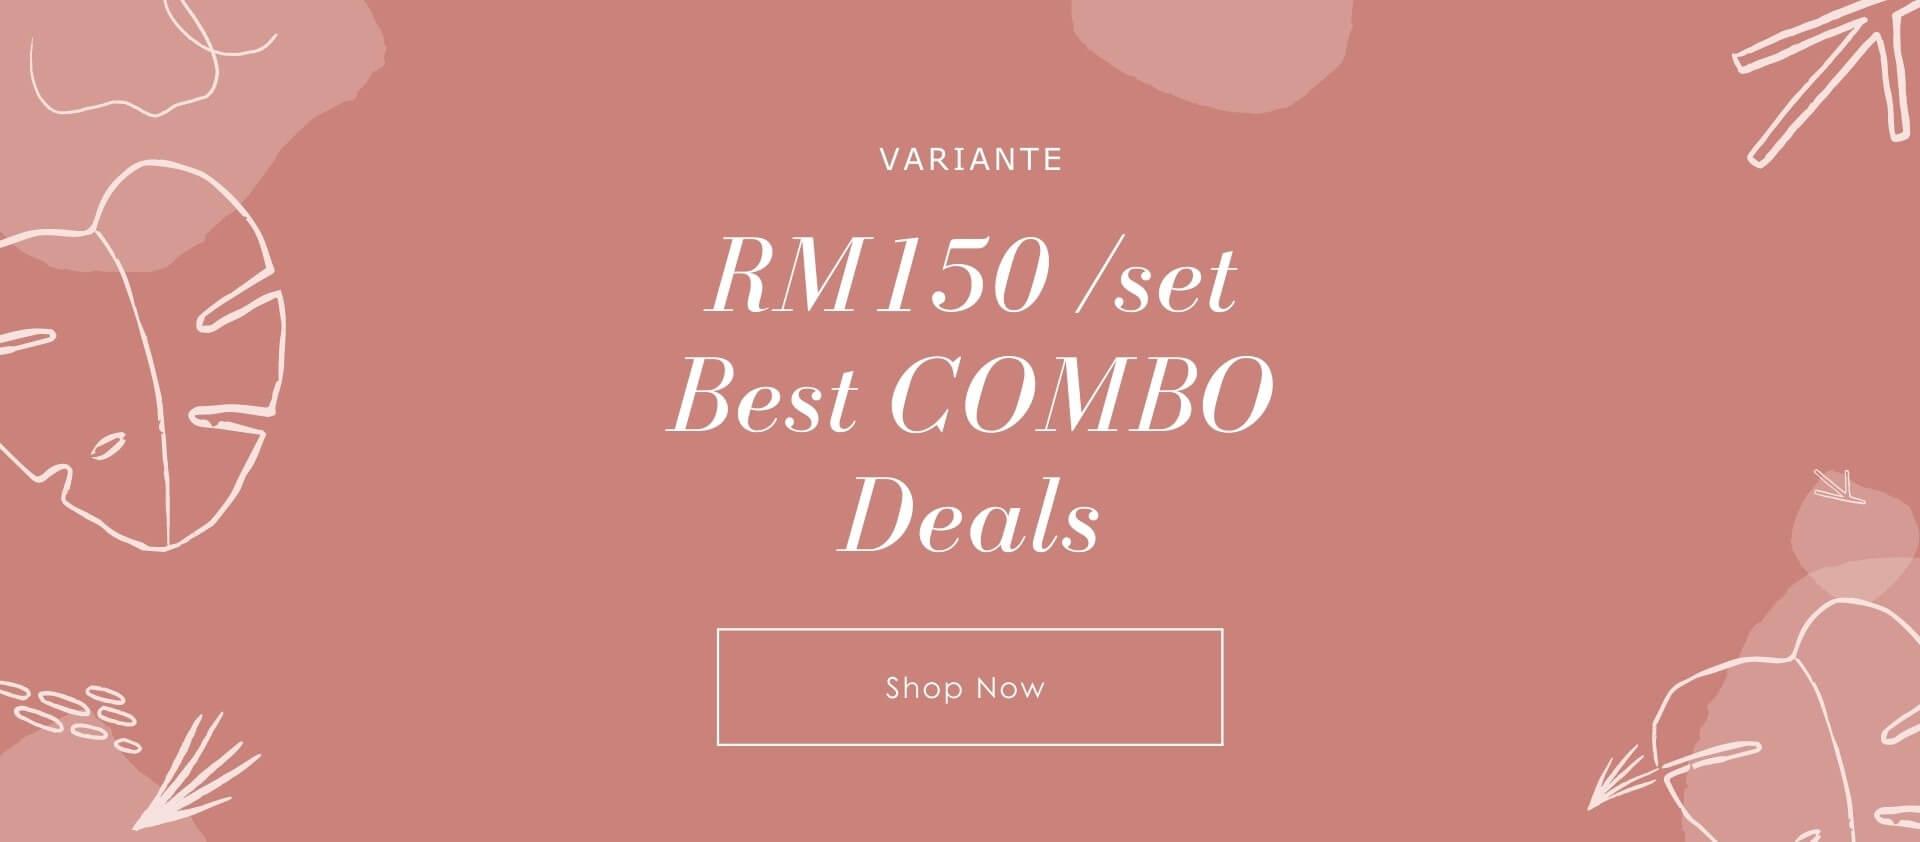 Combo deals banner